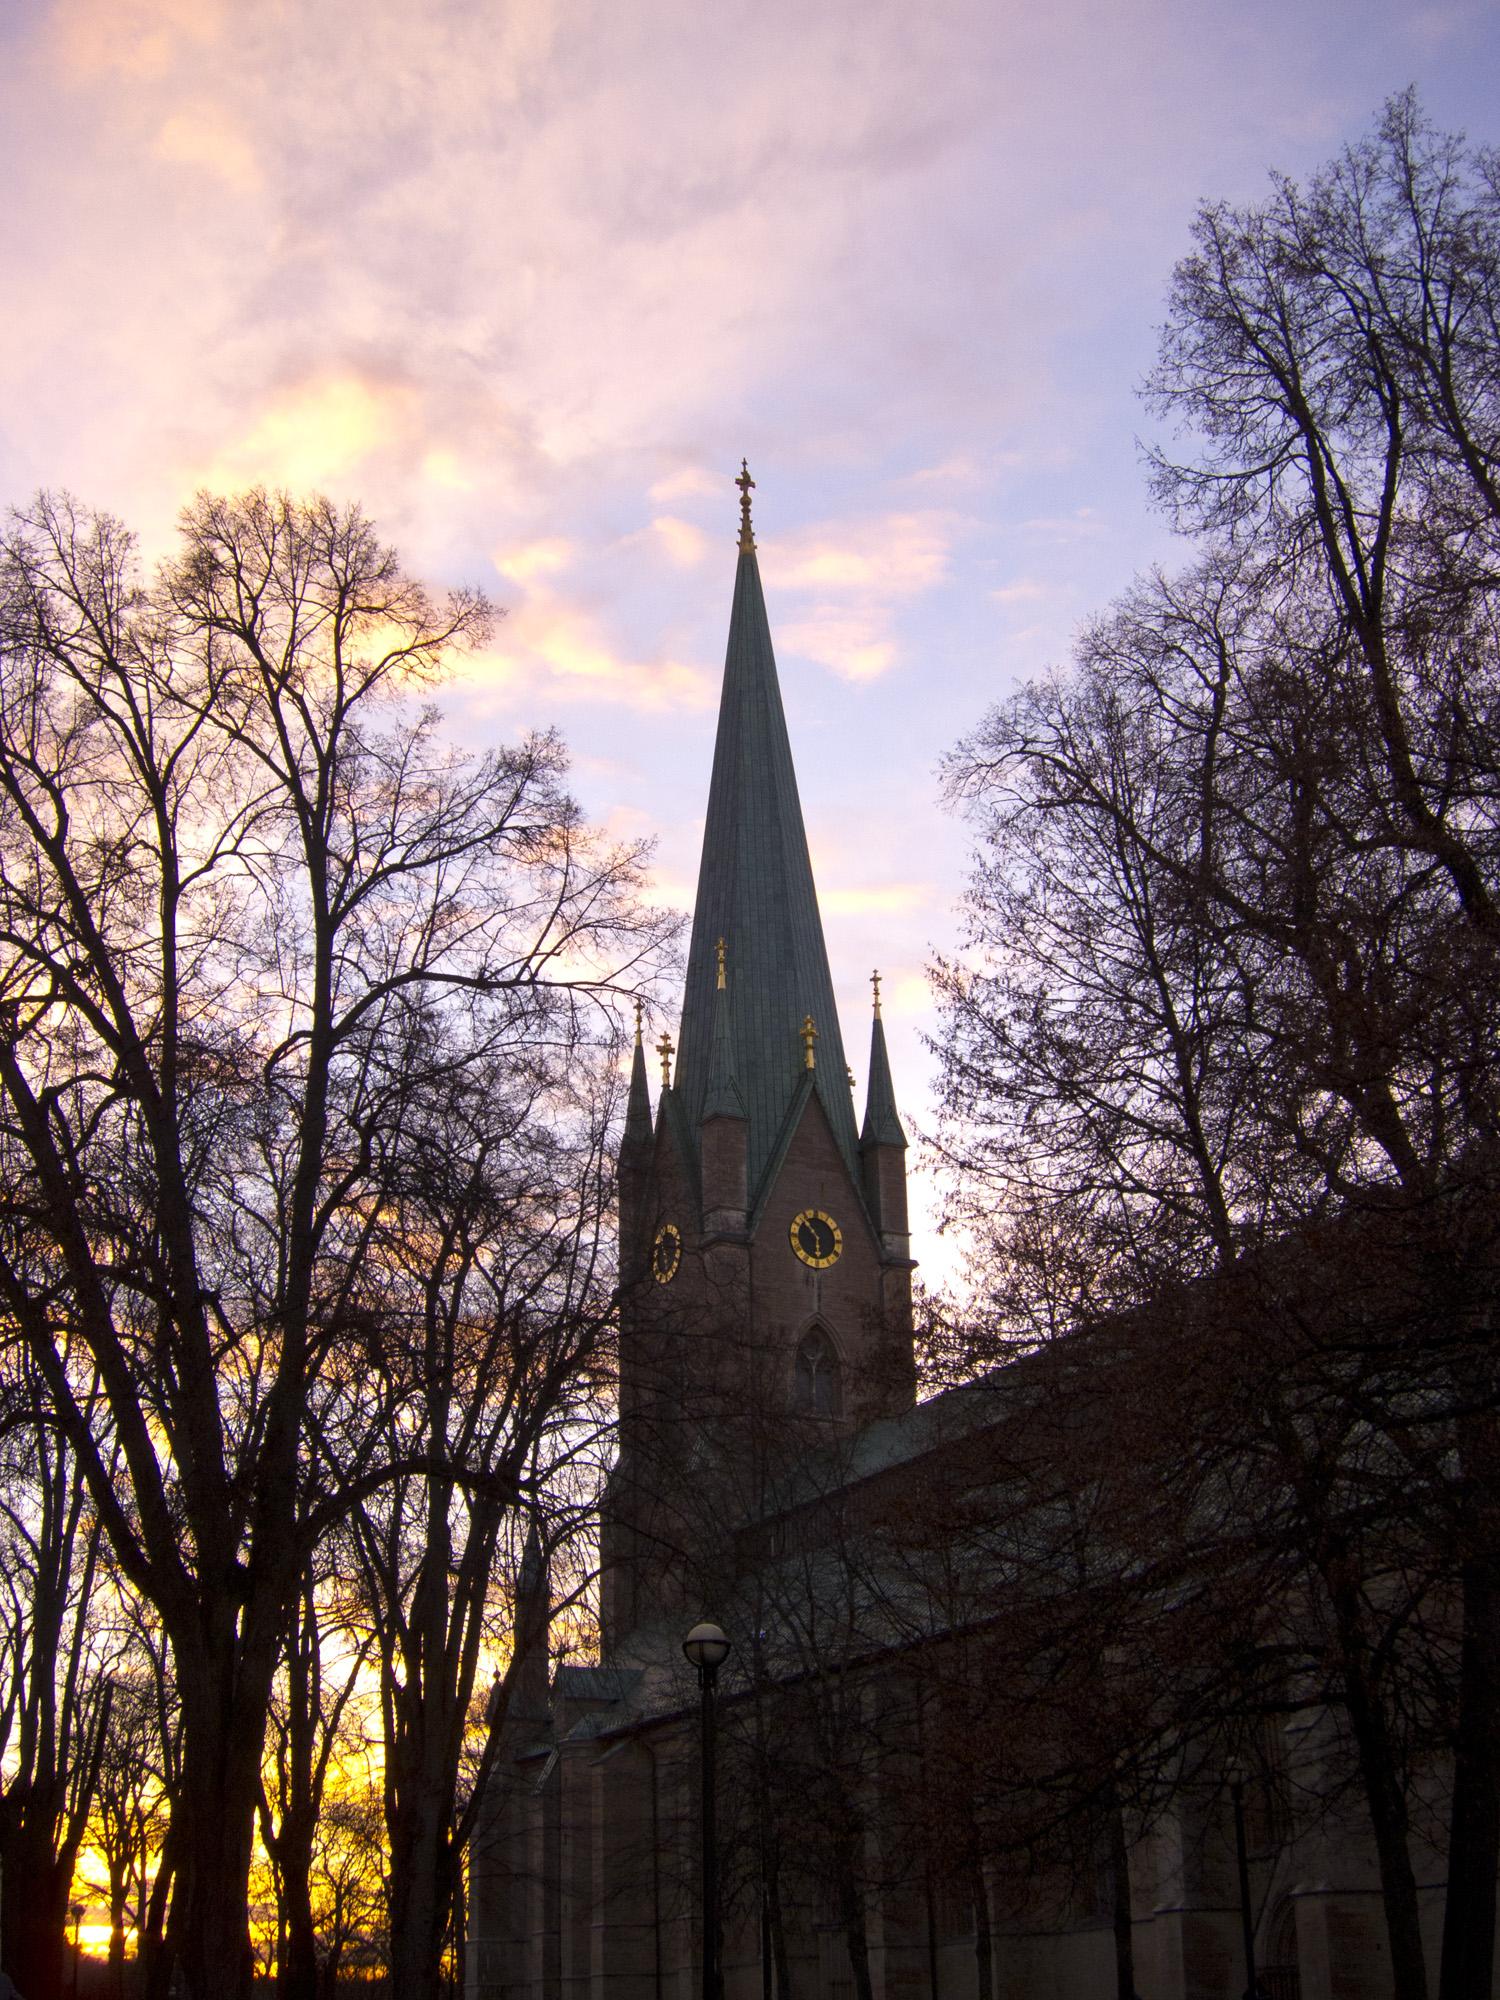 2016-03-27 Johannes kök 01